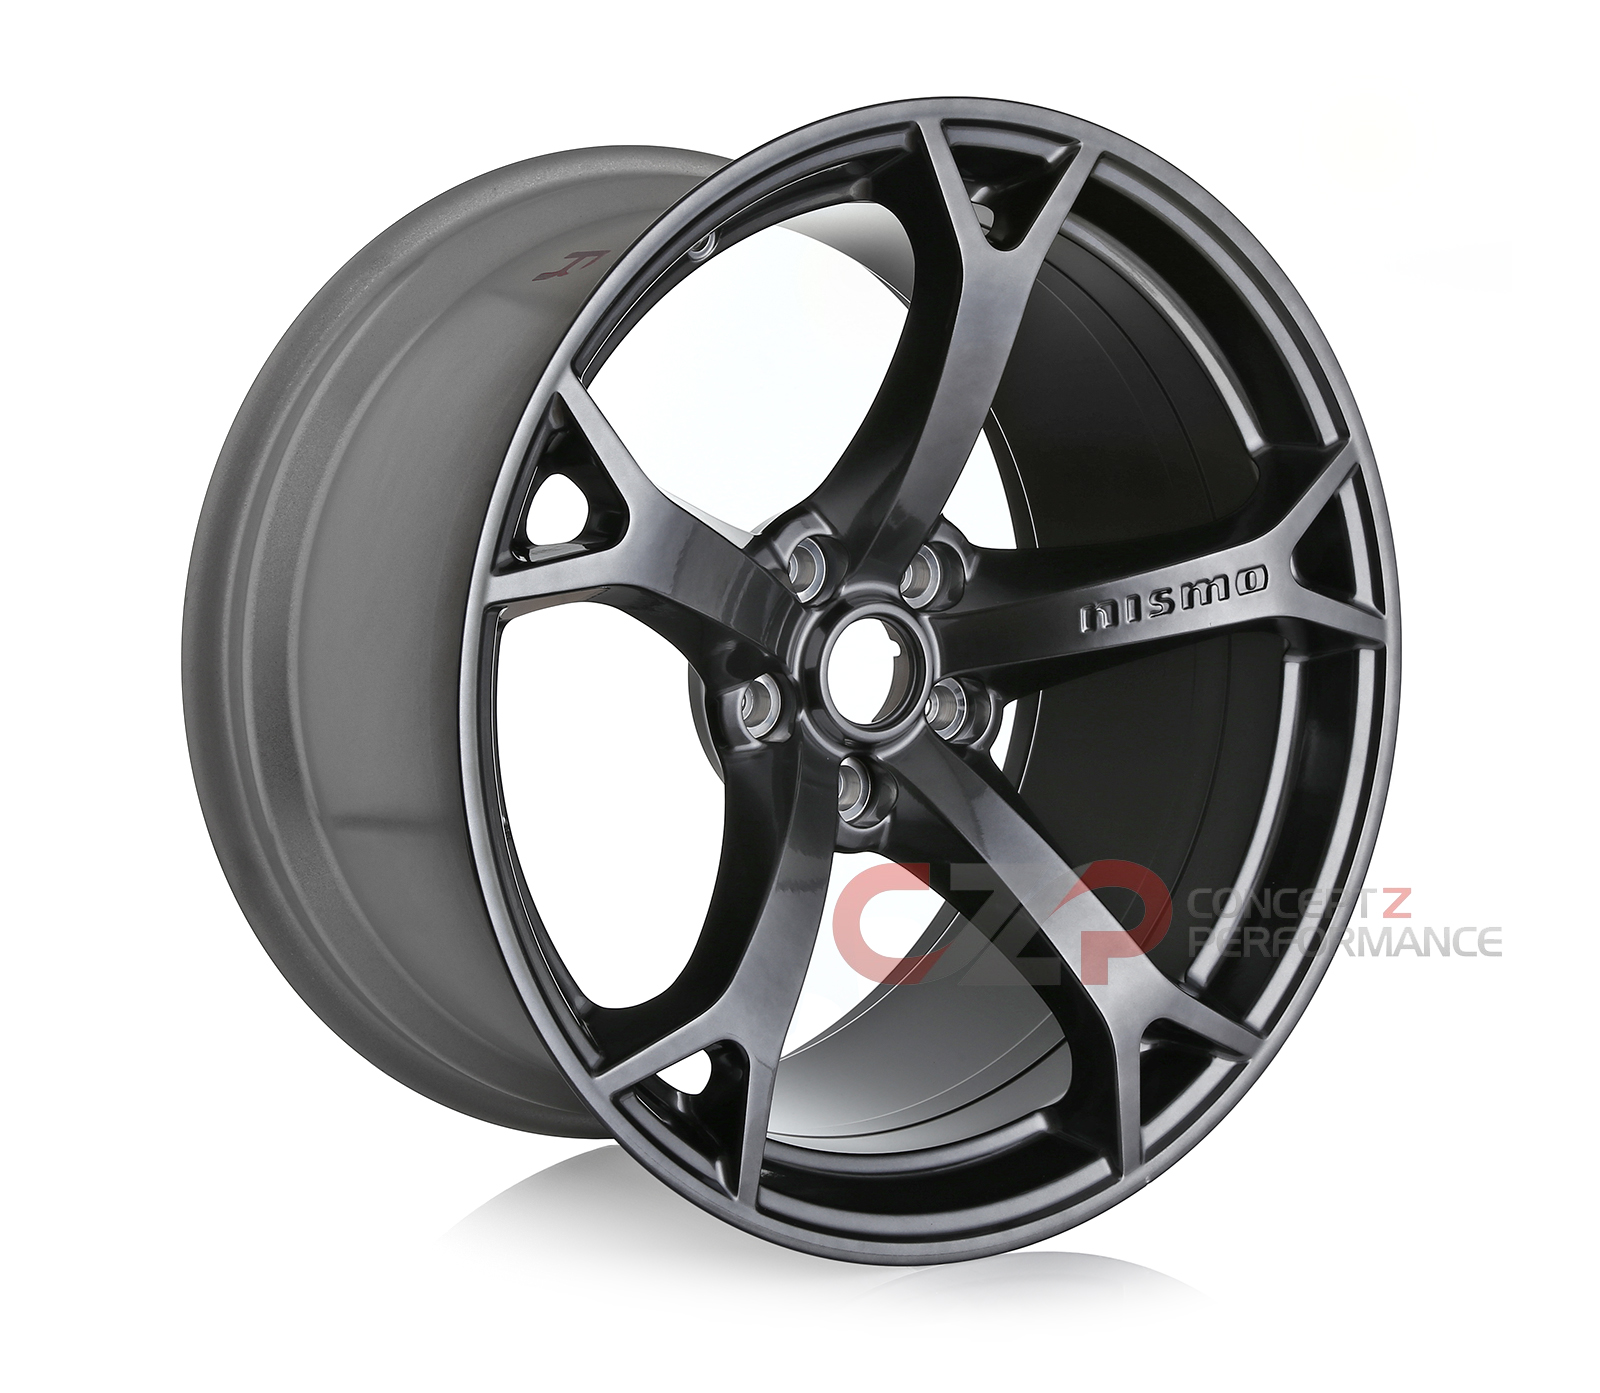 Nissan Infiniti Nissan Oem Nismo Gunmetal Wheel Rim Rear